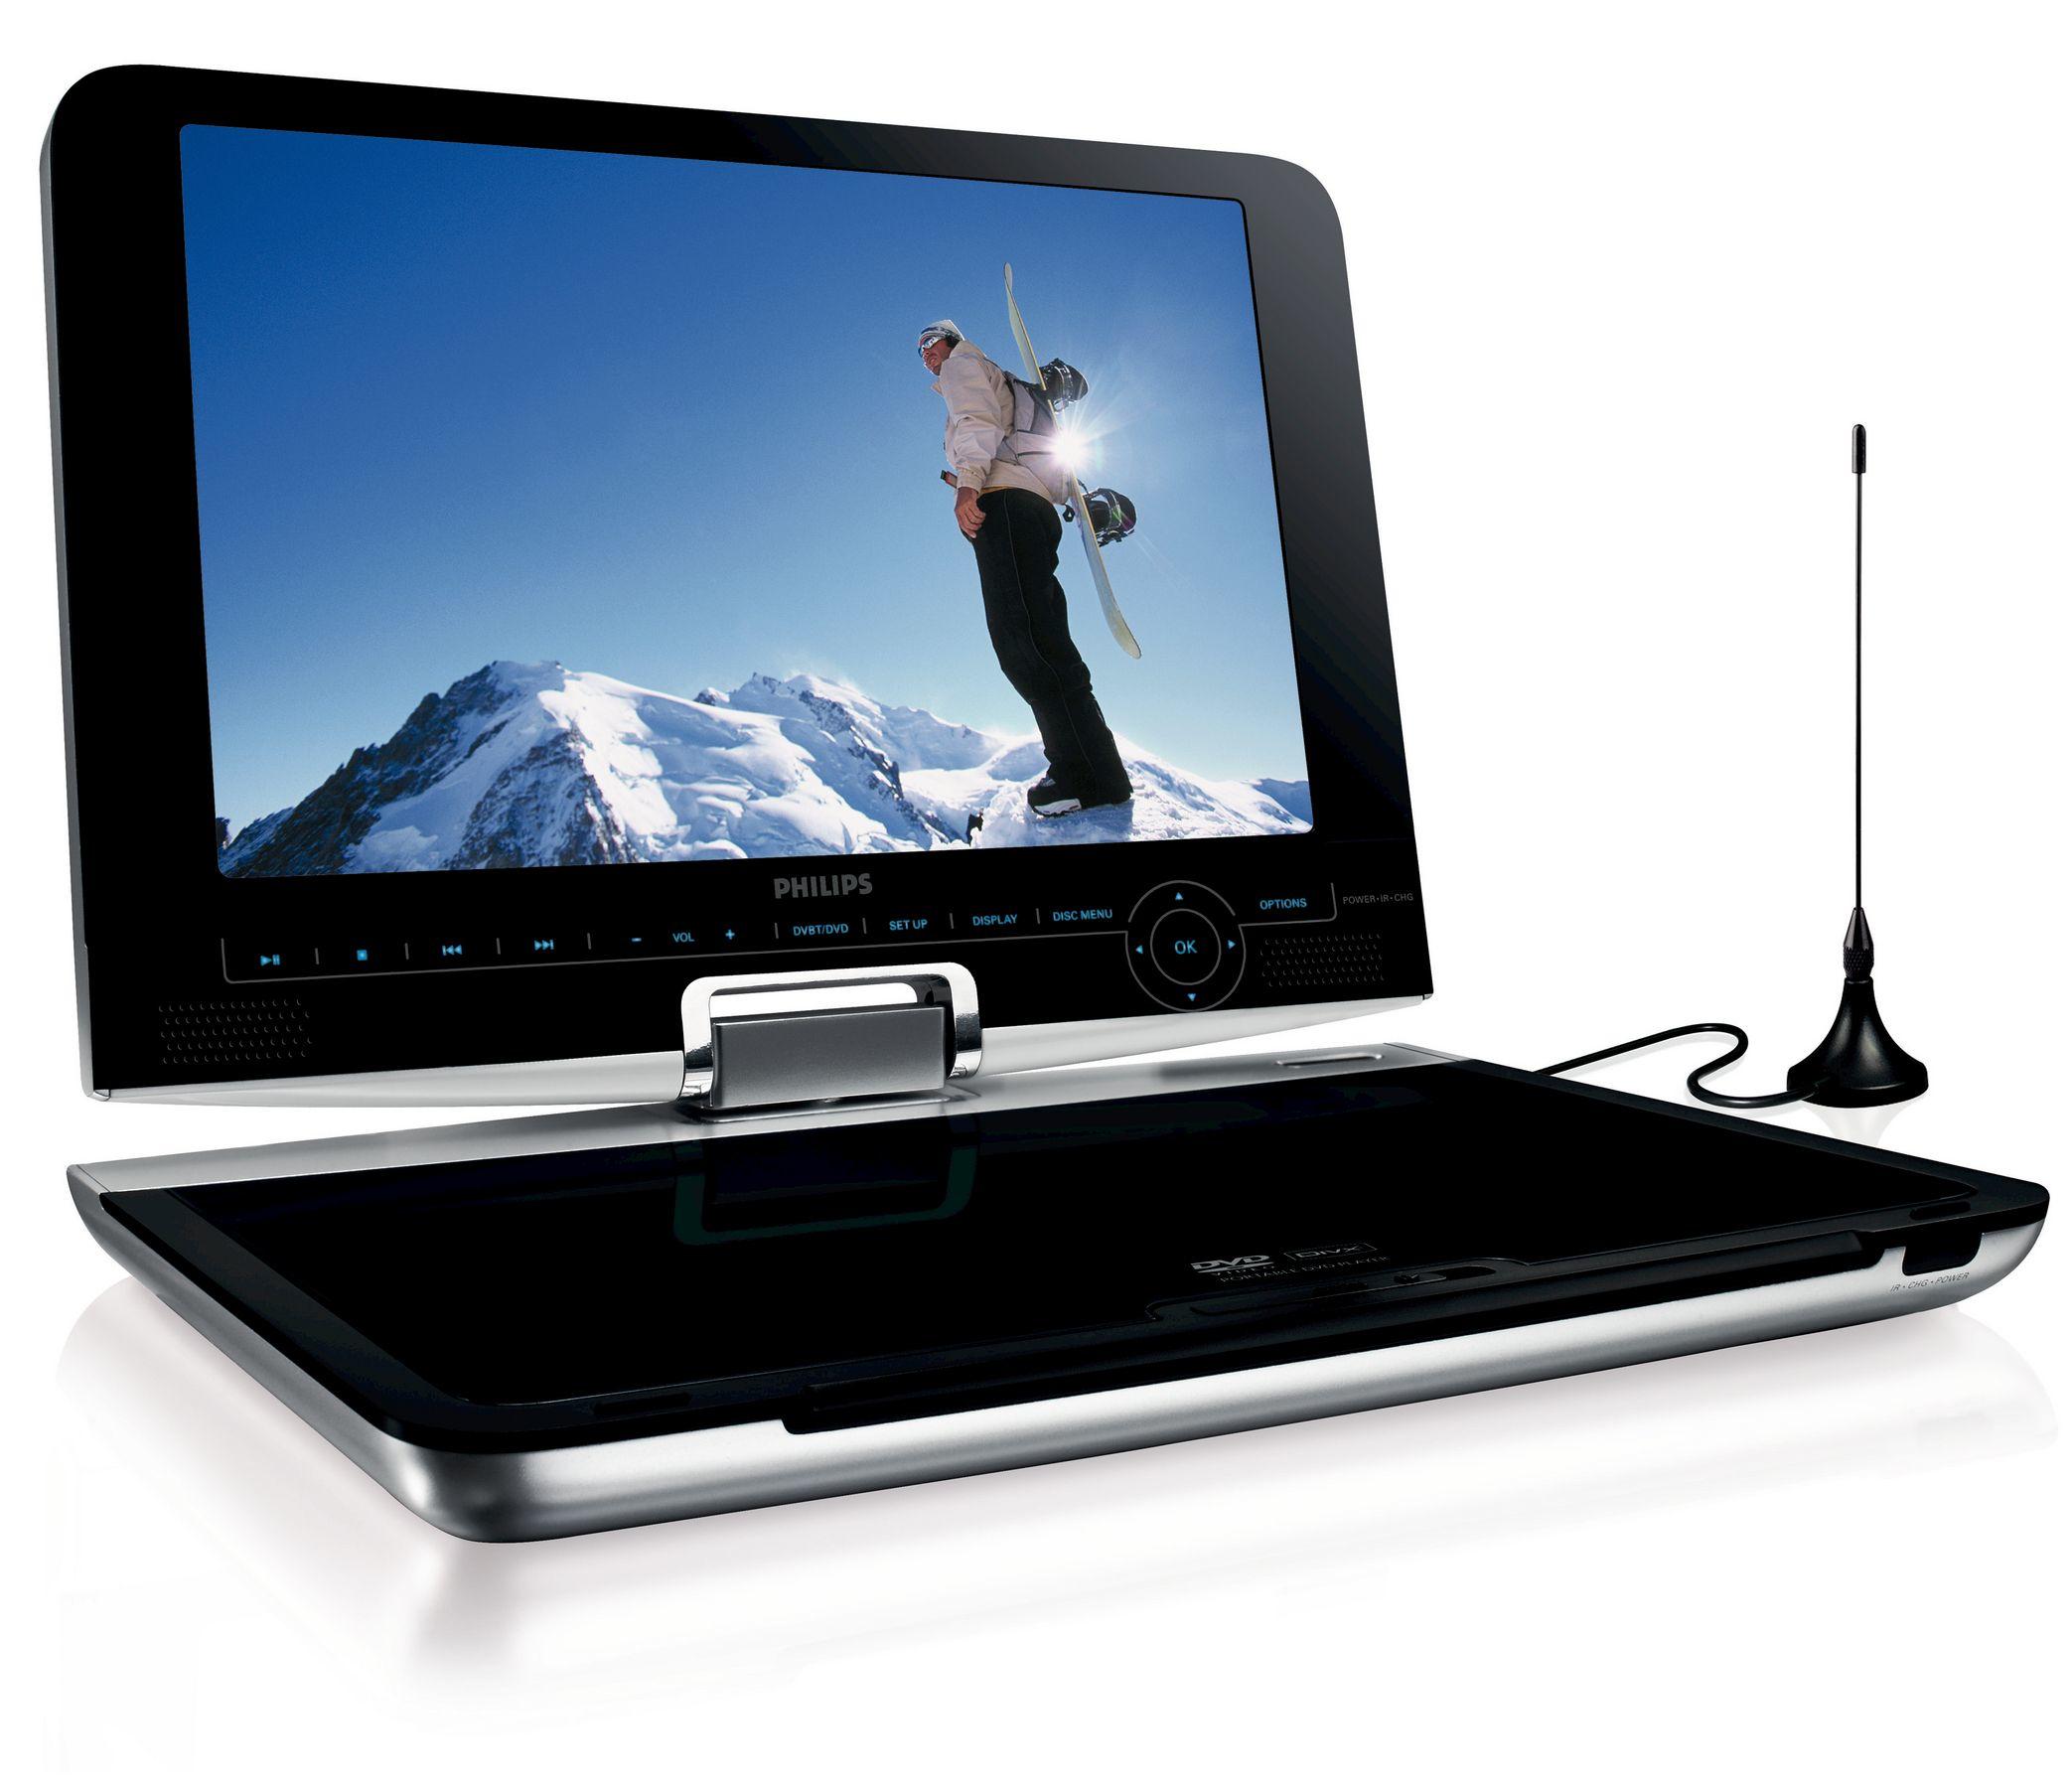 Philips Lettore DVD portatile PET1035/00